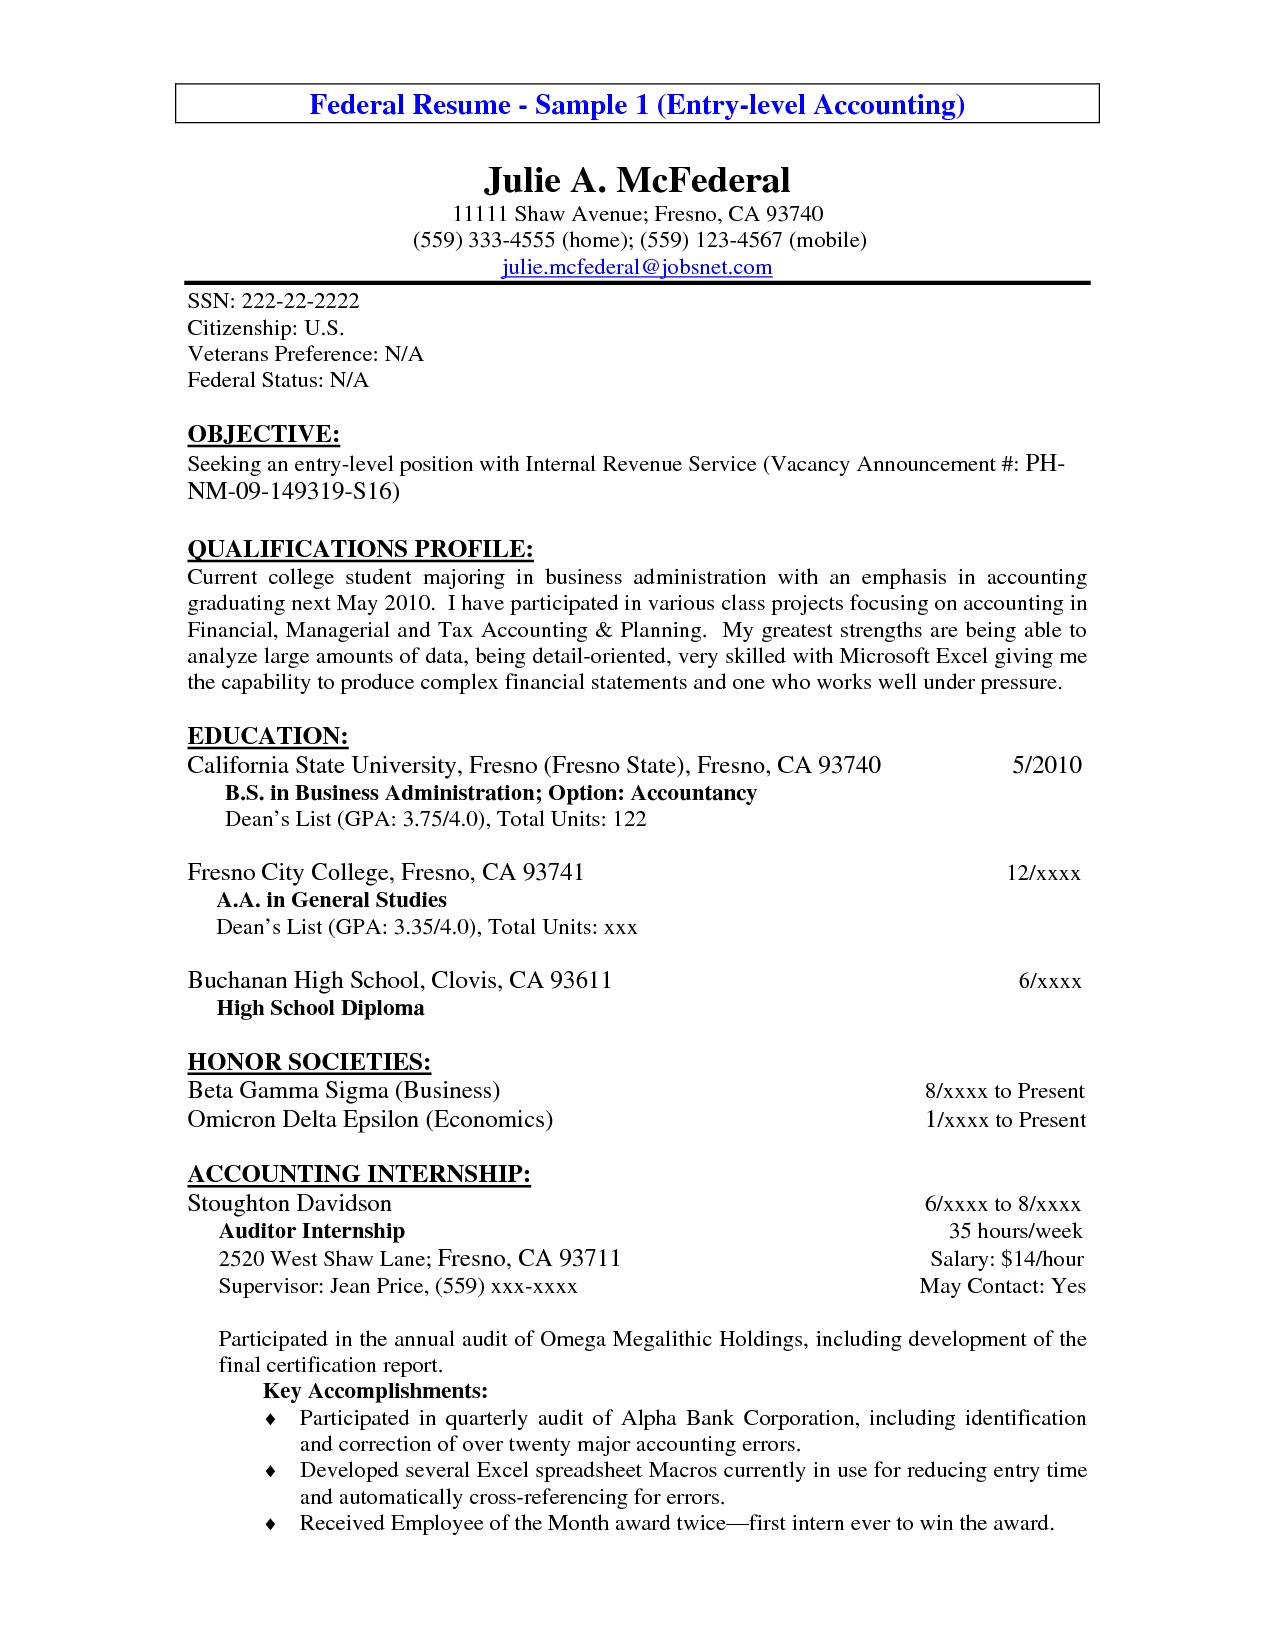 Work Objective Resume Sample